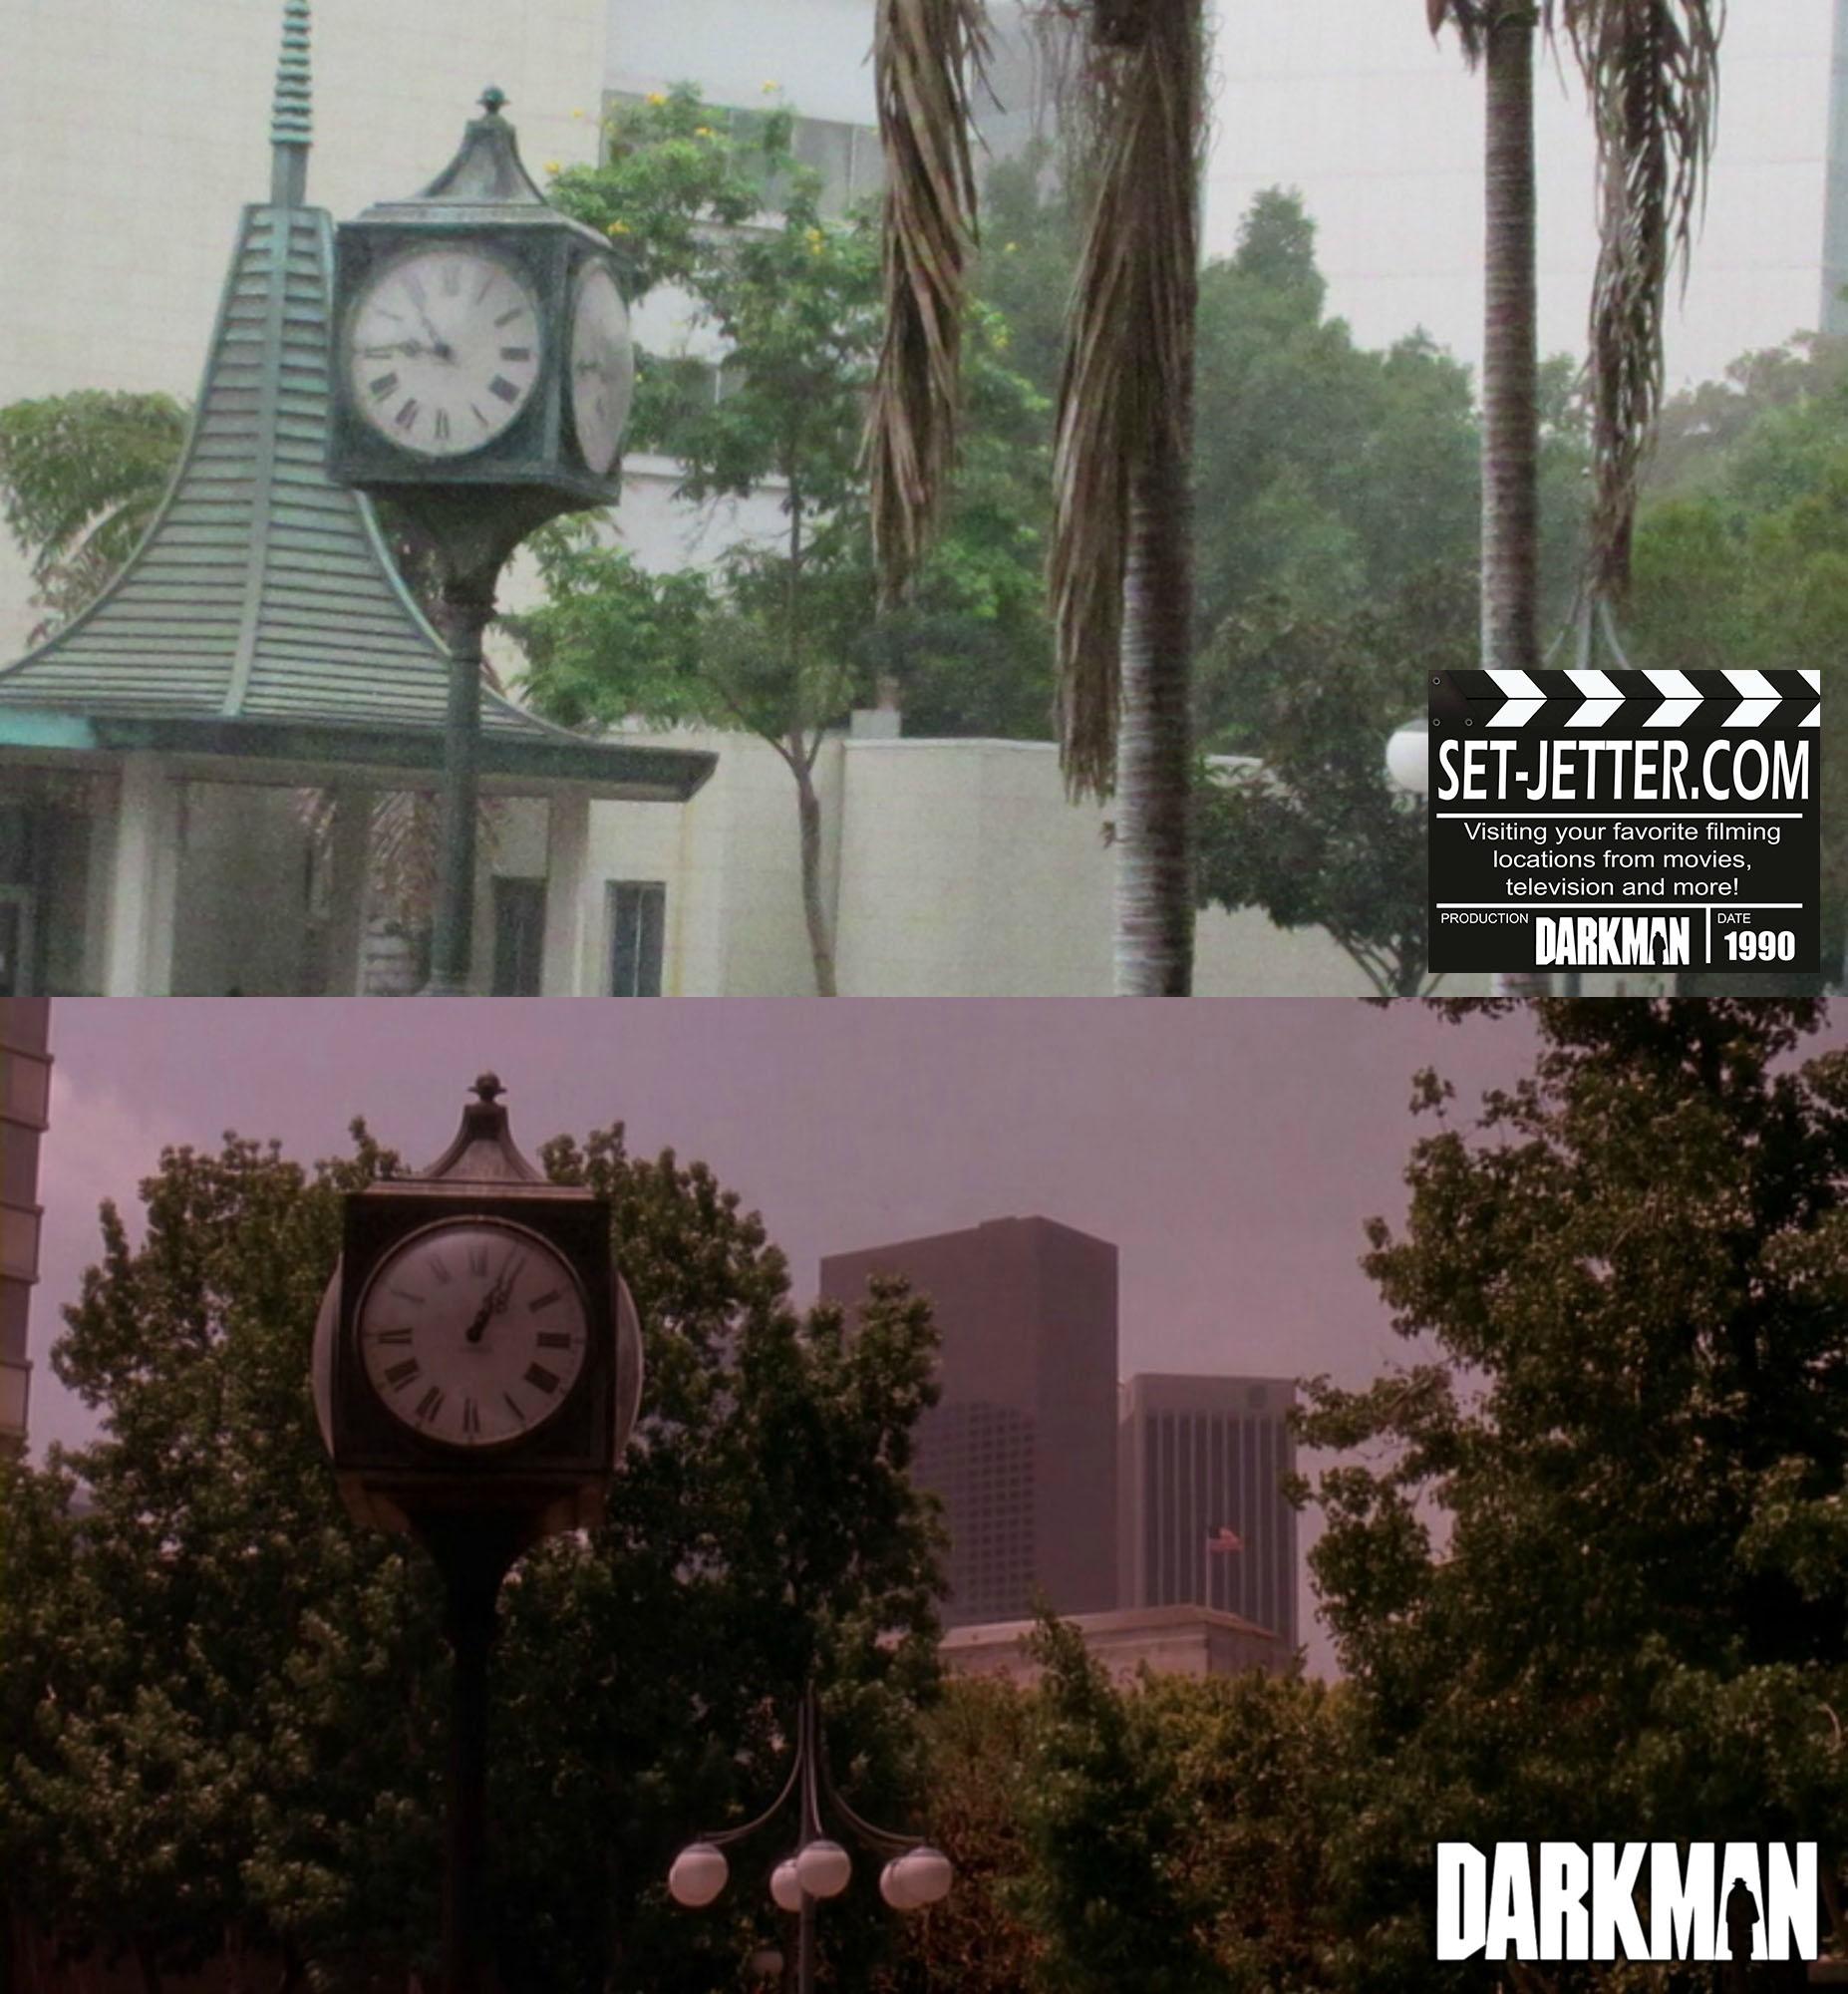 Darkman 15.jpg